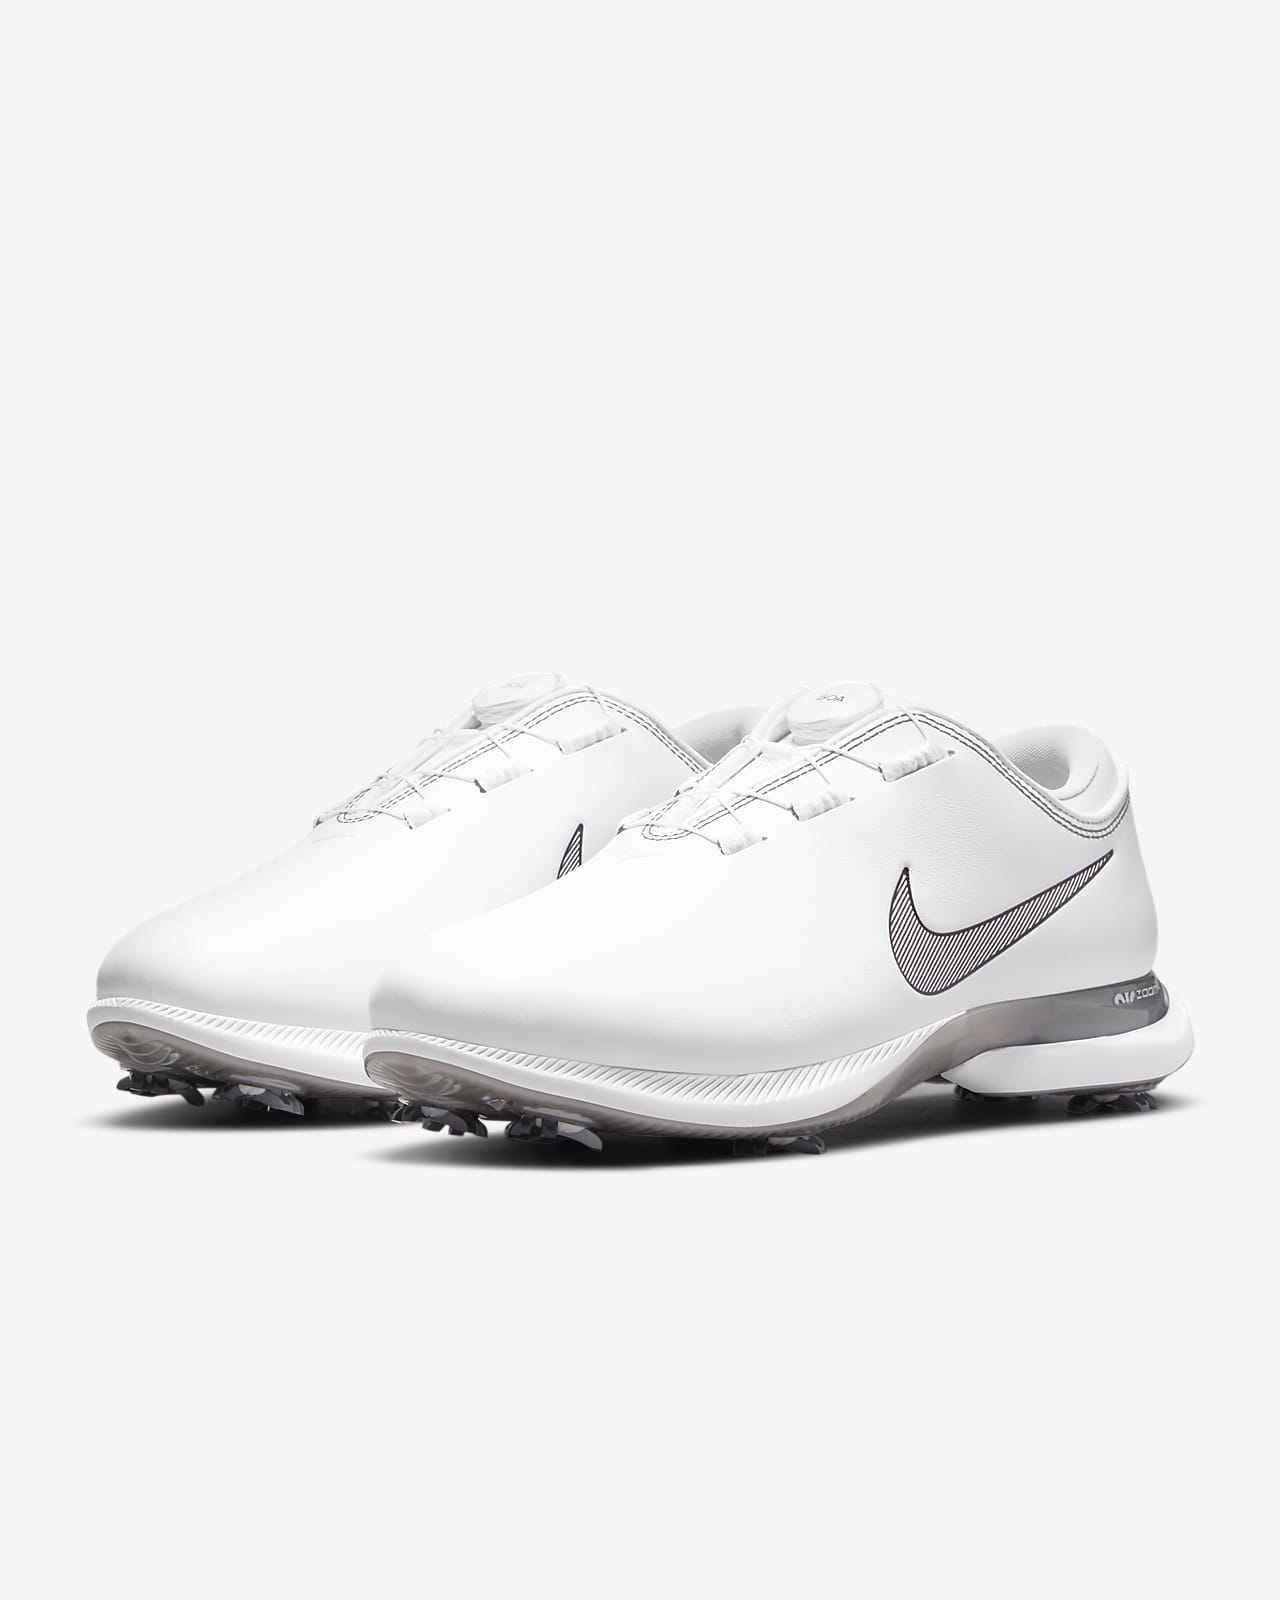 Nike Air Zoom Victory Tour 2 Boa Golf Shoes (Wide). Nike JP